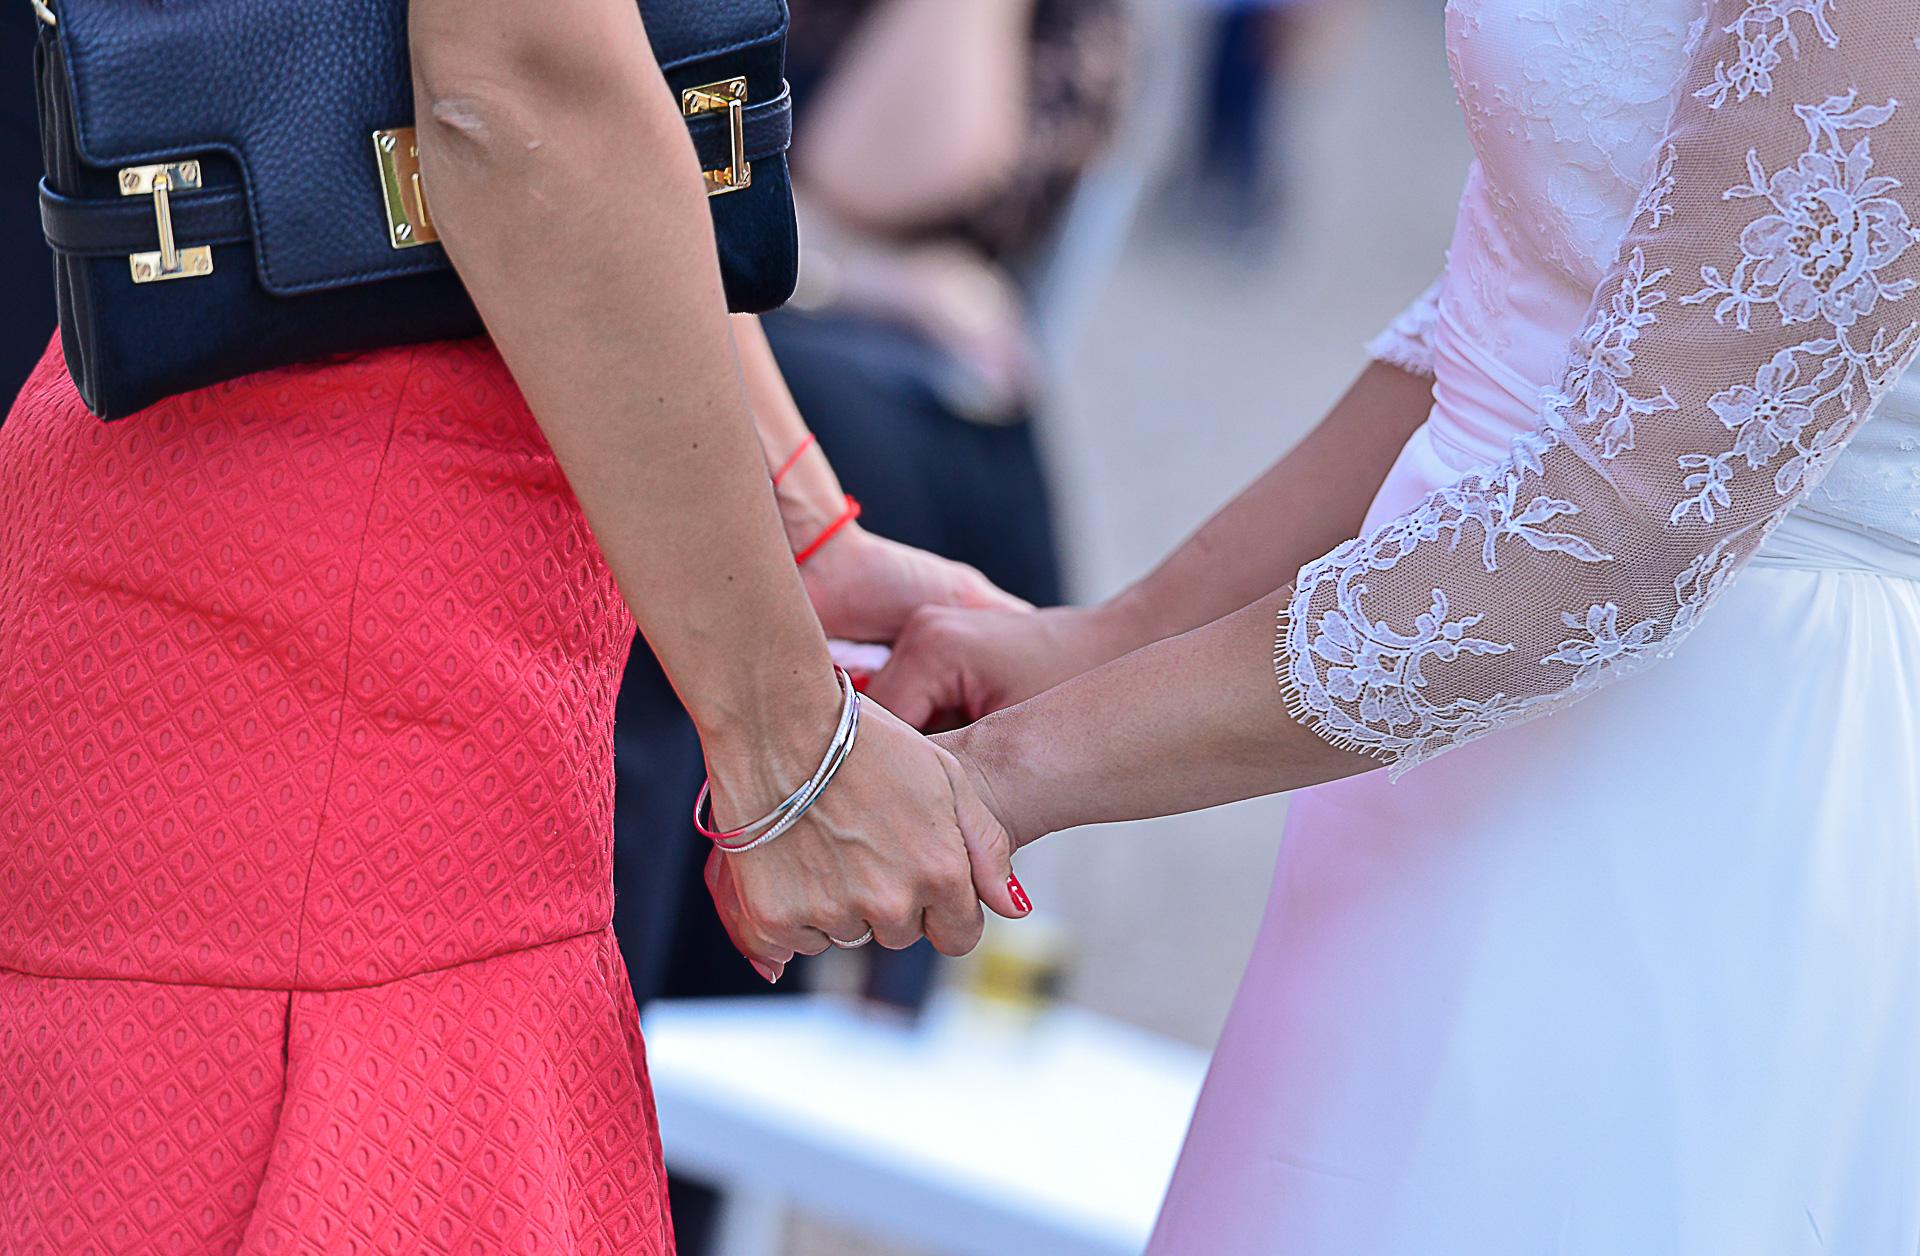 photographe-mariage-paris-reportage-photos-mariee